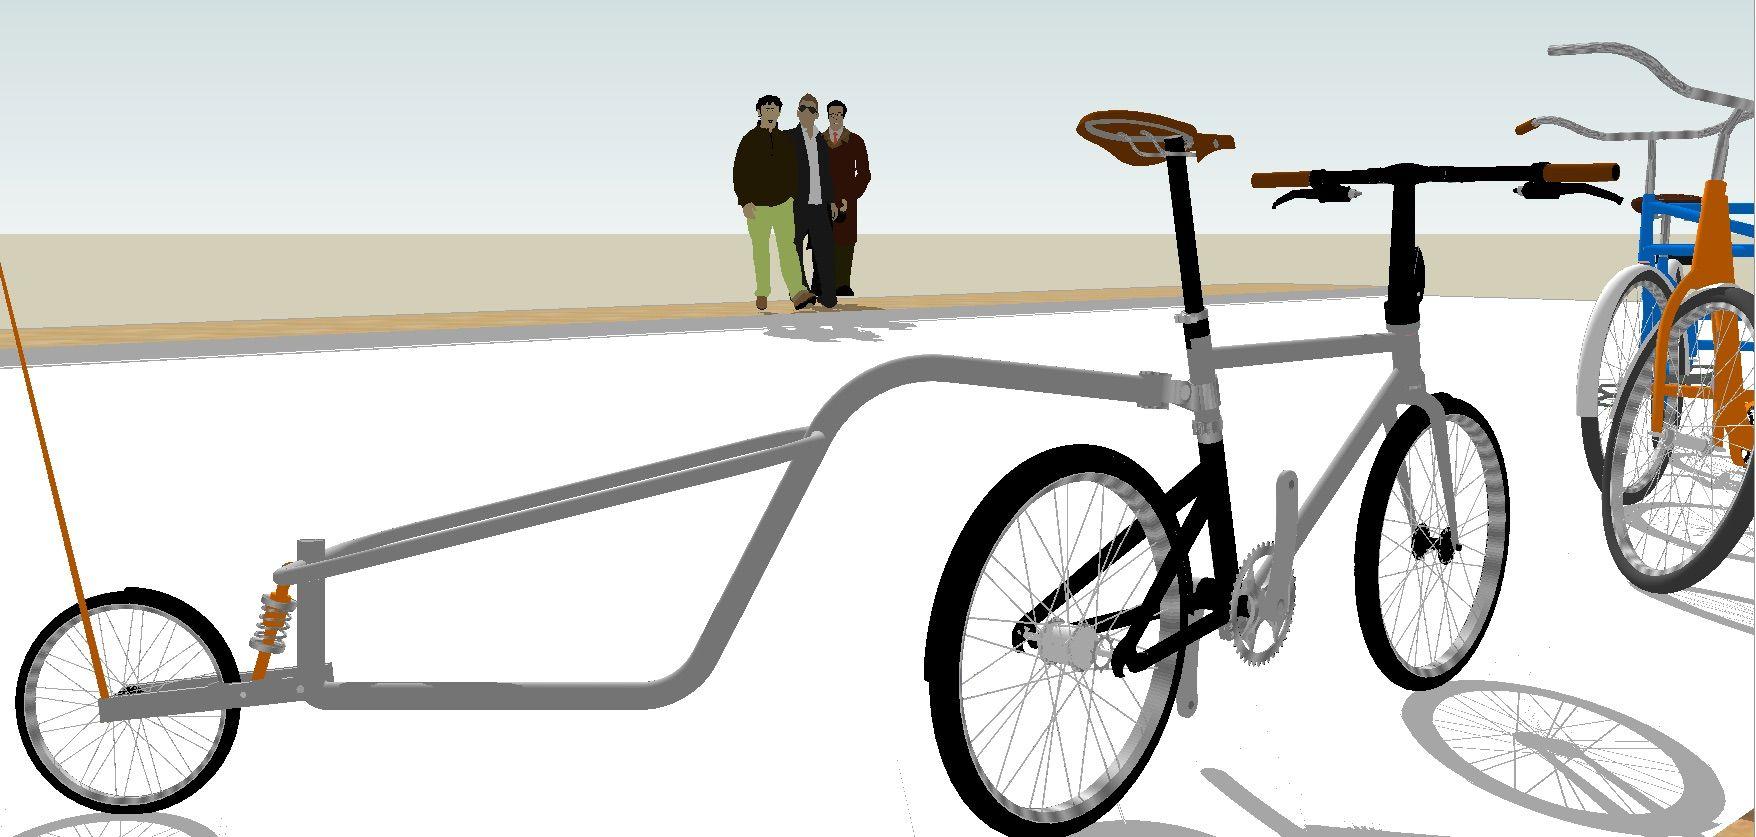 Onewheel Biketrailer Bikenrun Designandbuild Customs Bandung